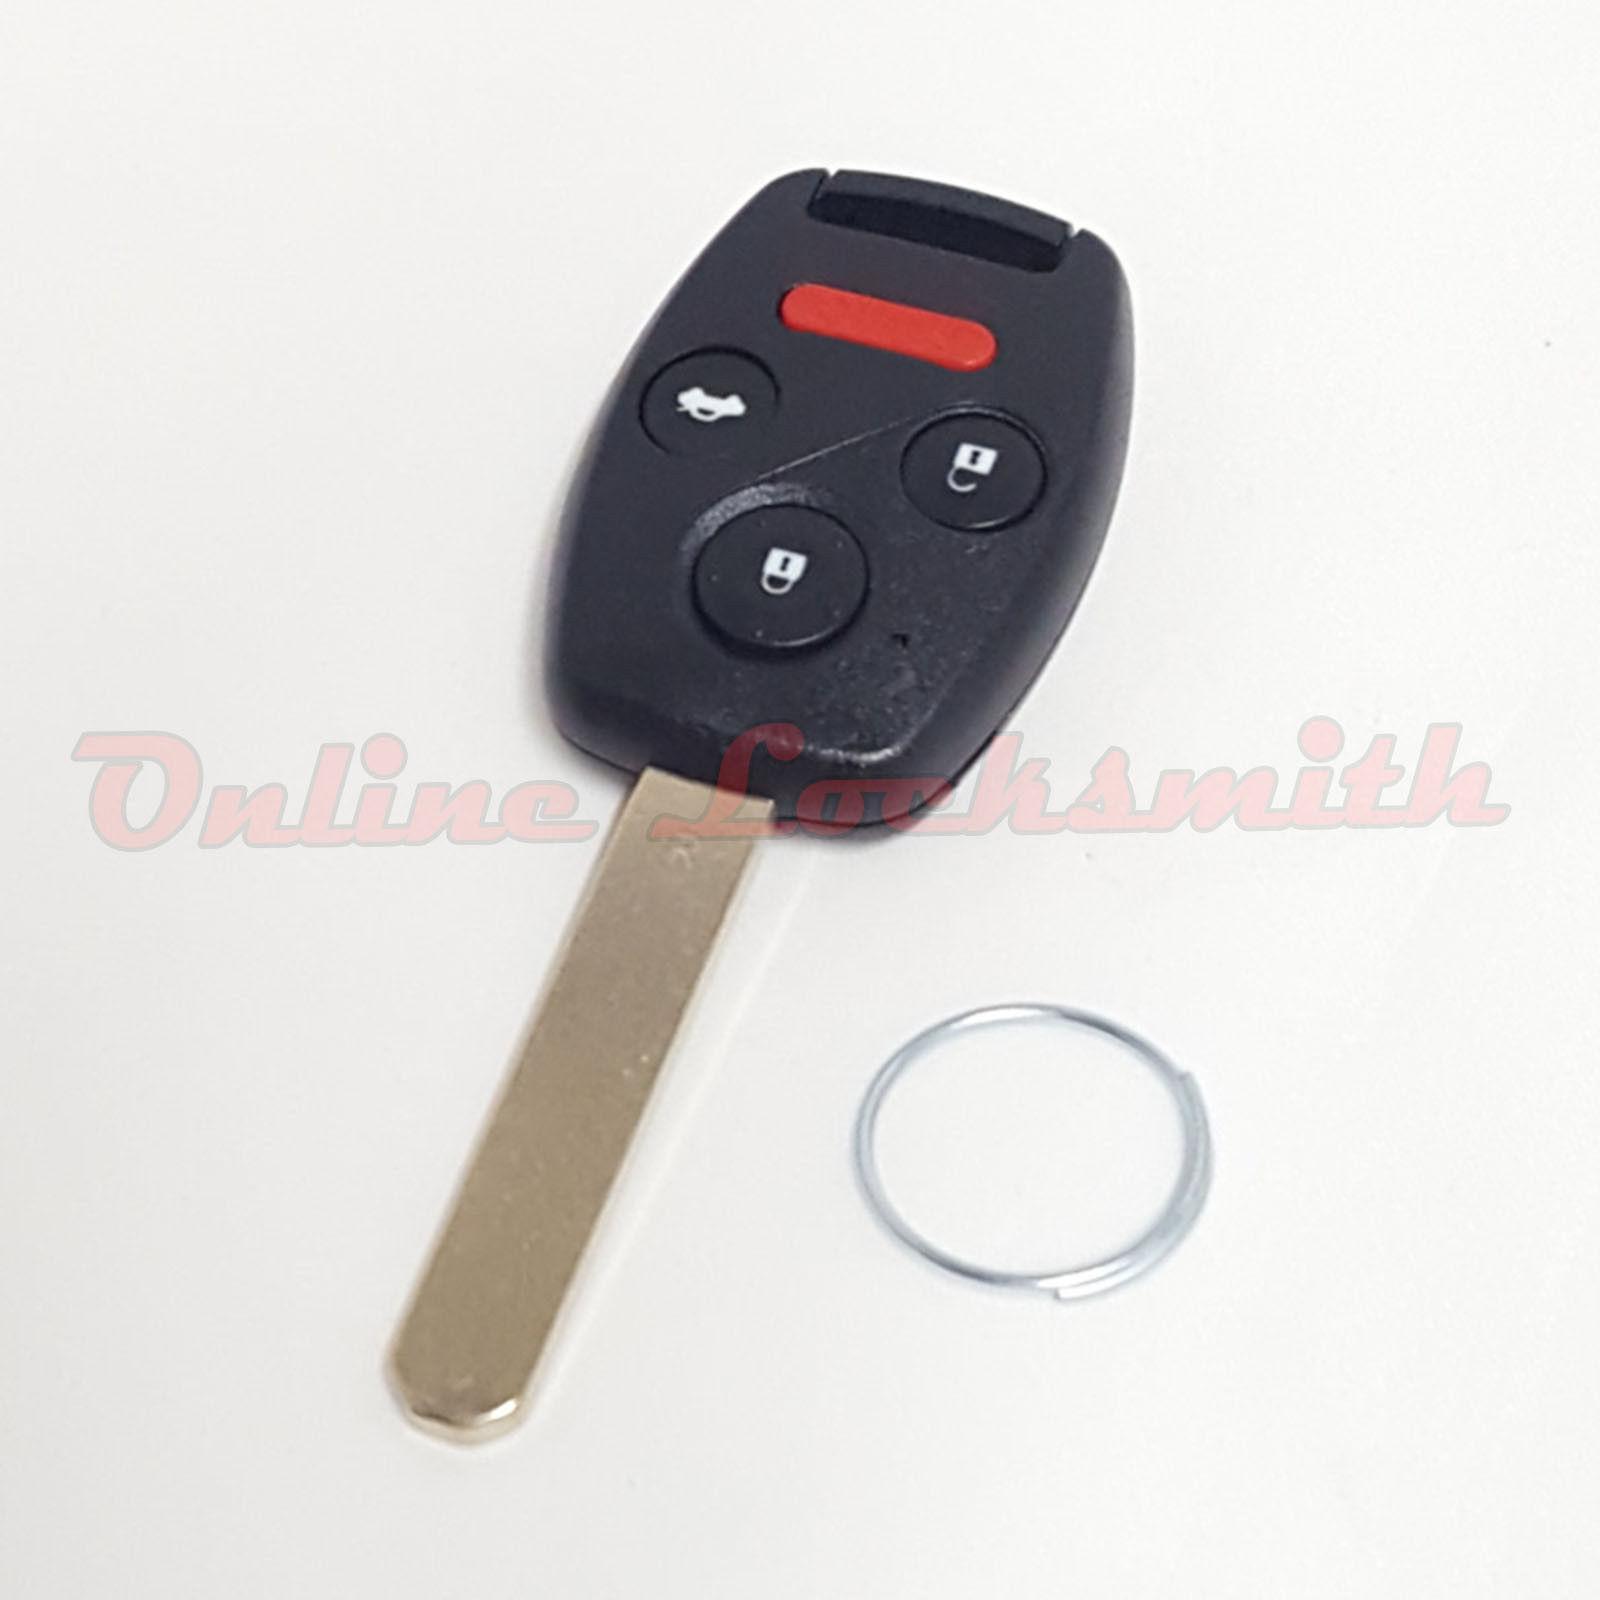 Replacement Honda Accord, Civic & Pilot Remote Key FOB